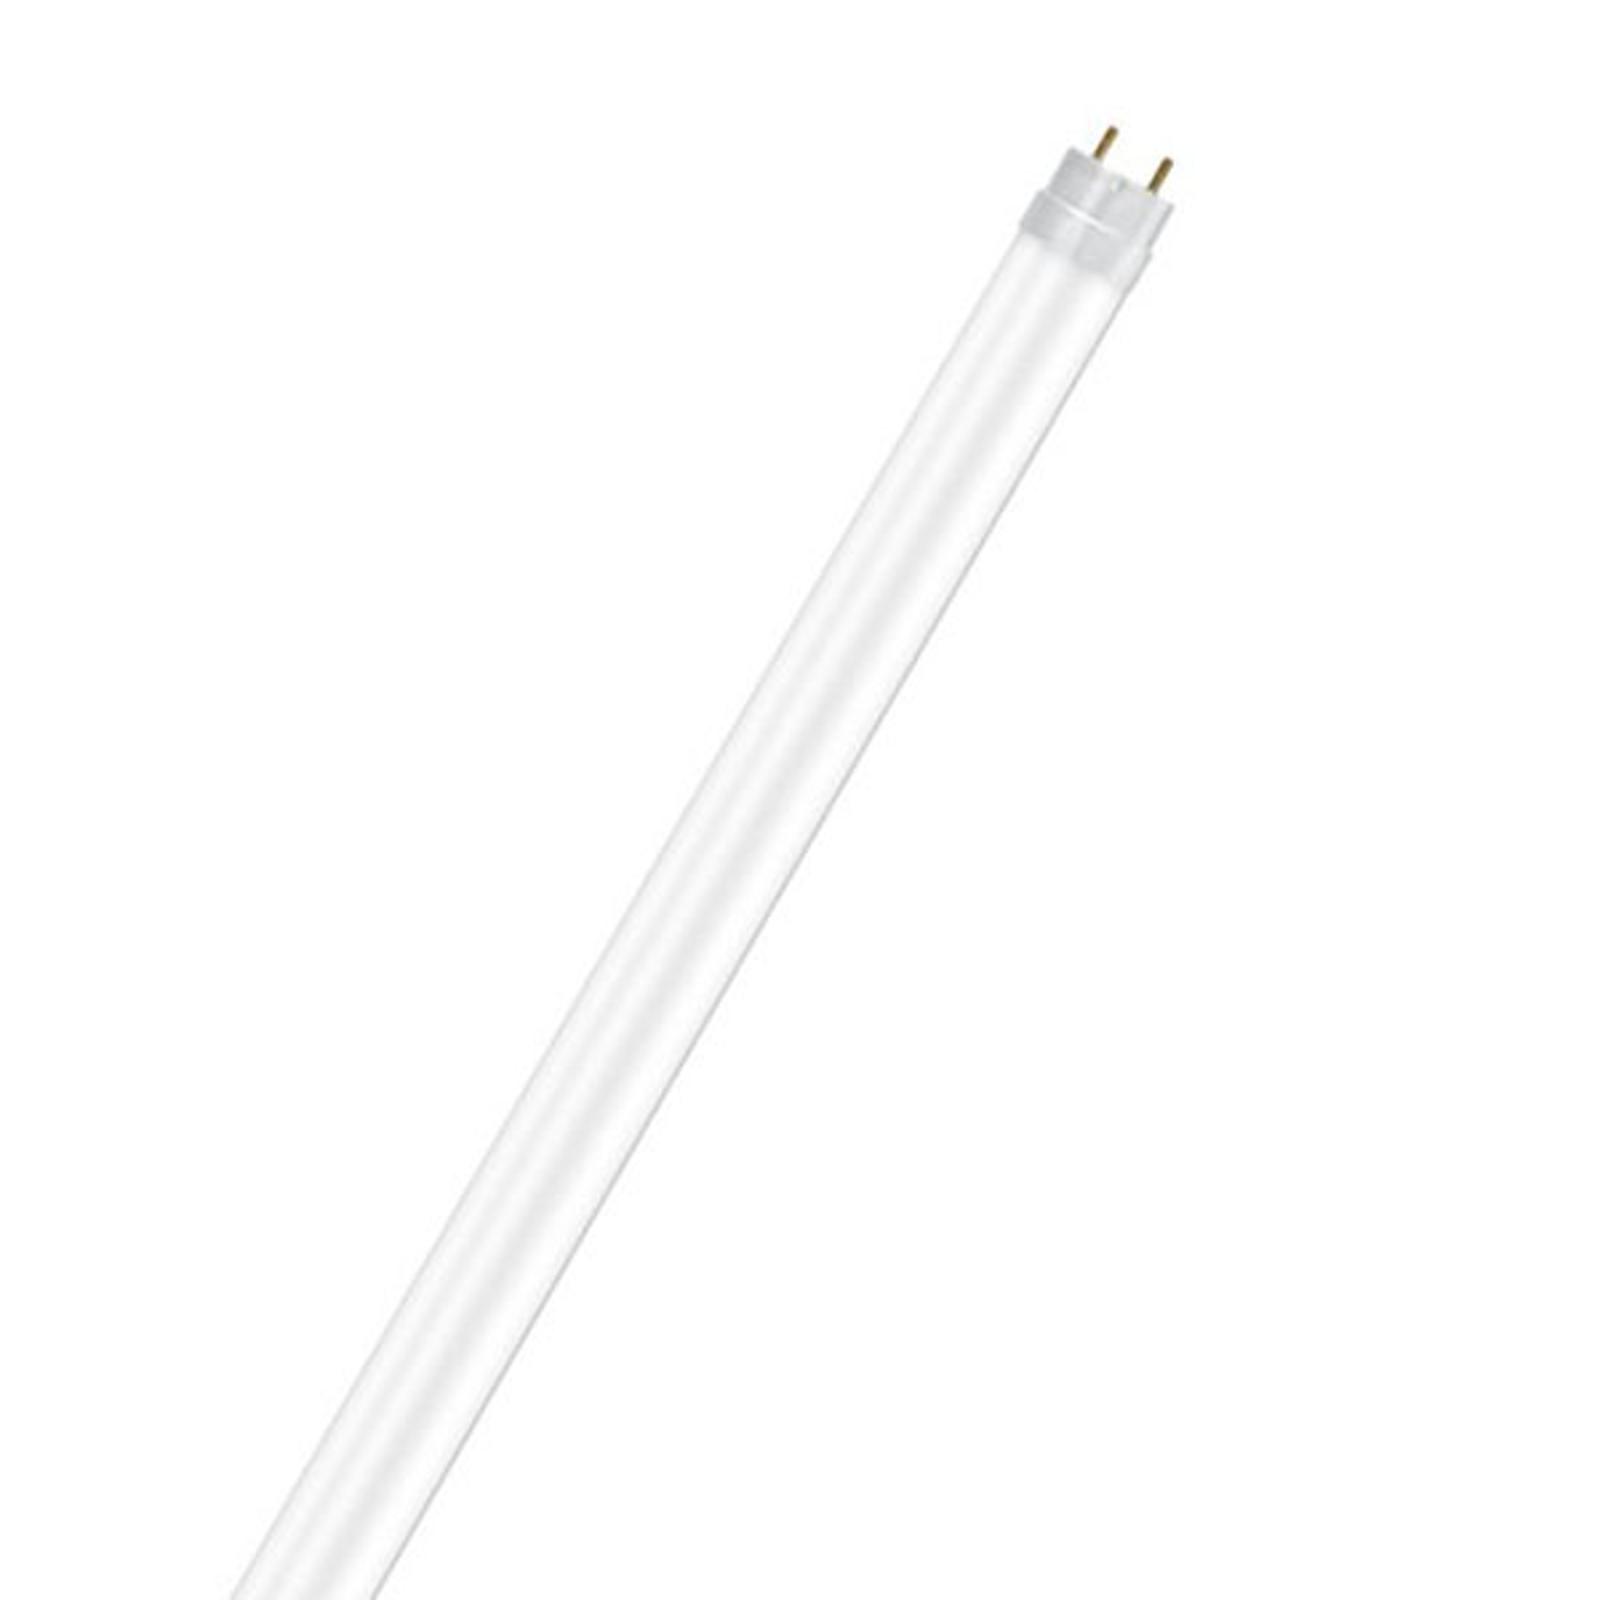 OSRAM-LED-putki G13 150cm SubstiTUBE 20W 6 500 K